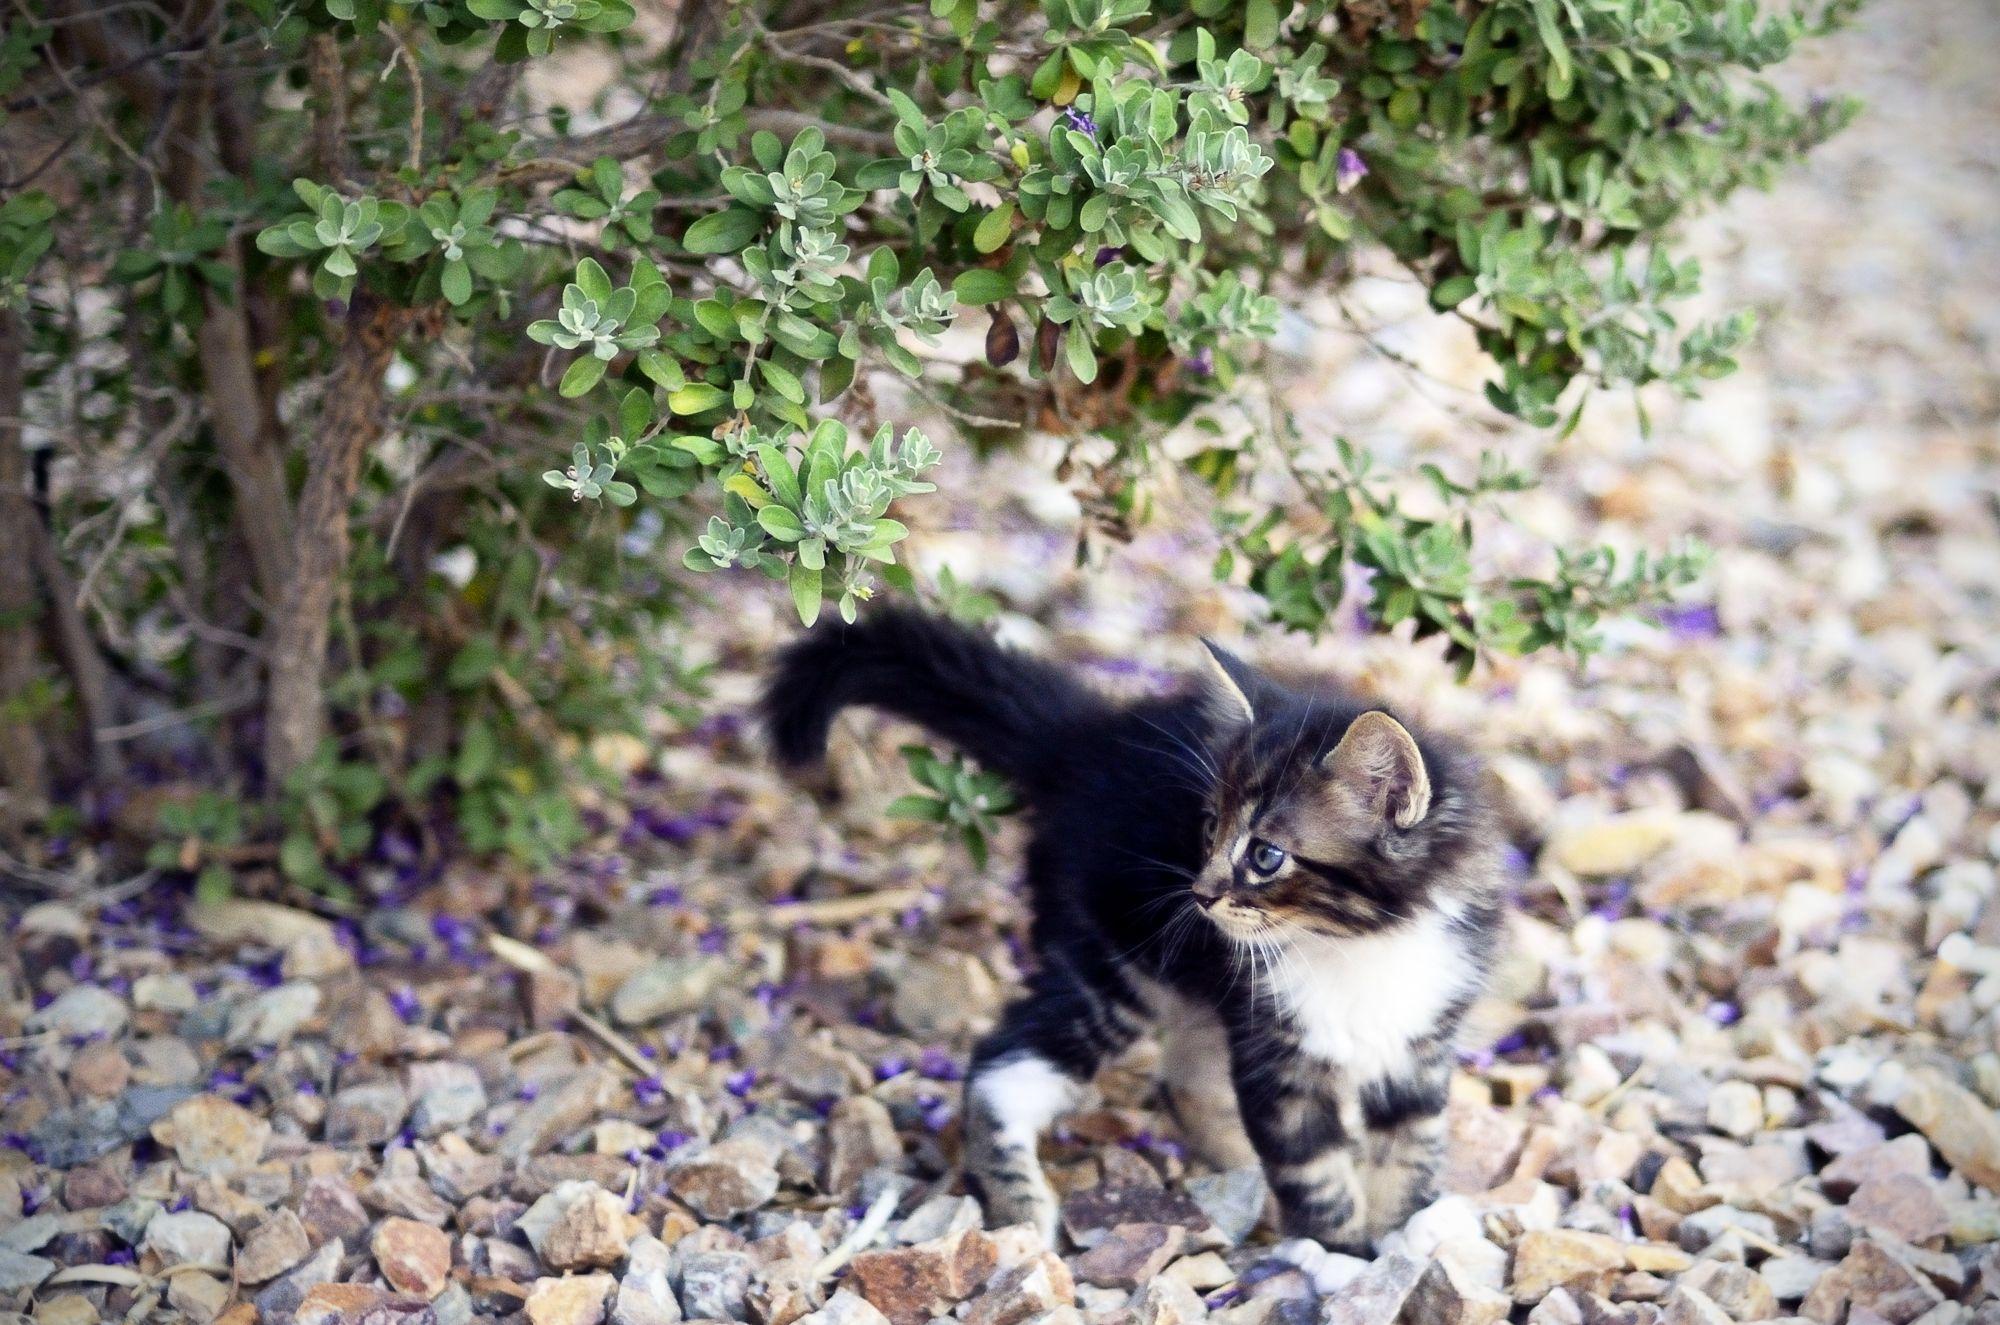 #animals #pets #cats #kitten Photo Credit - Pigeonfoot Photography www.pigeonfoot.com